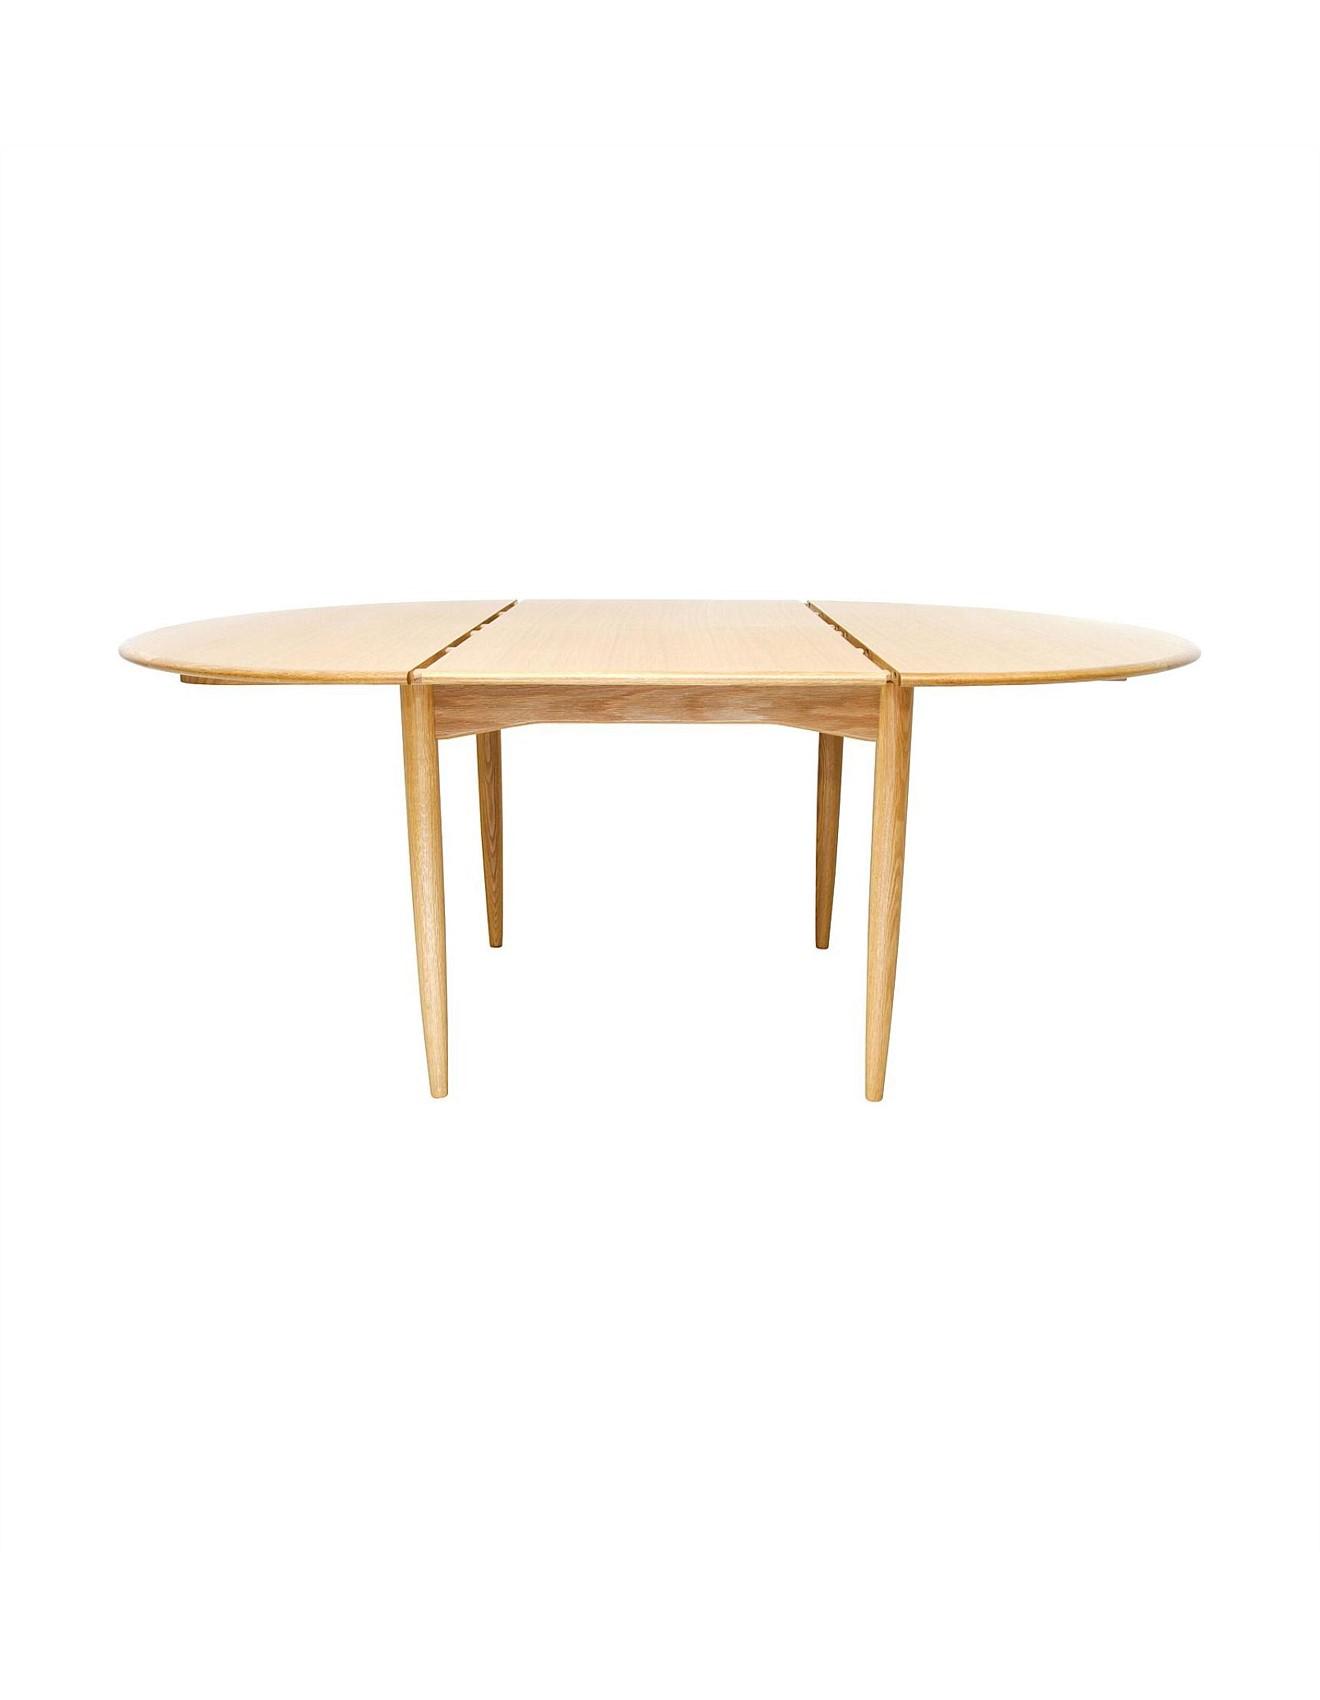 Furniture   Tables, Sofas, Armchairs & More   David Jones ...